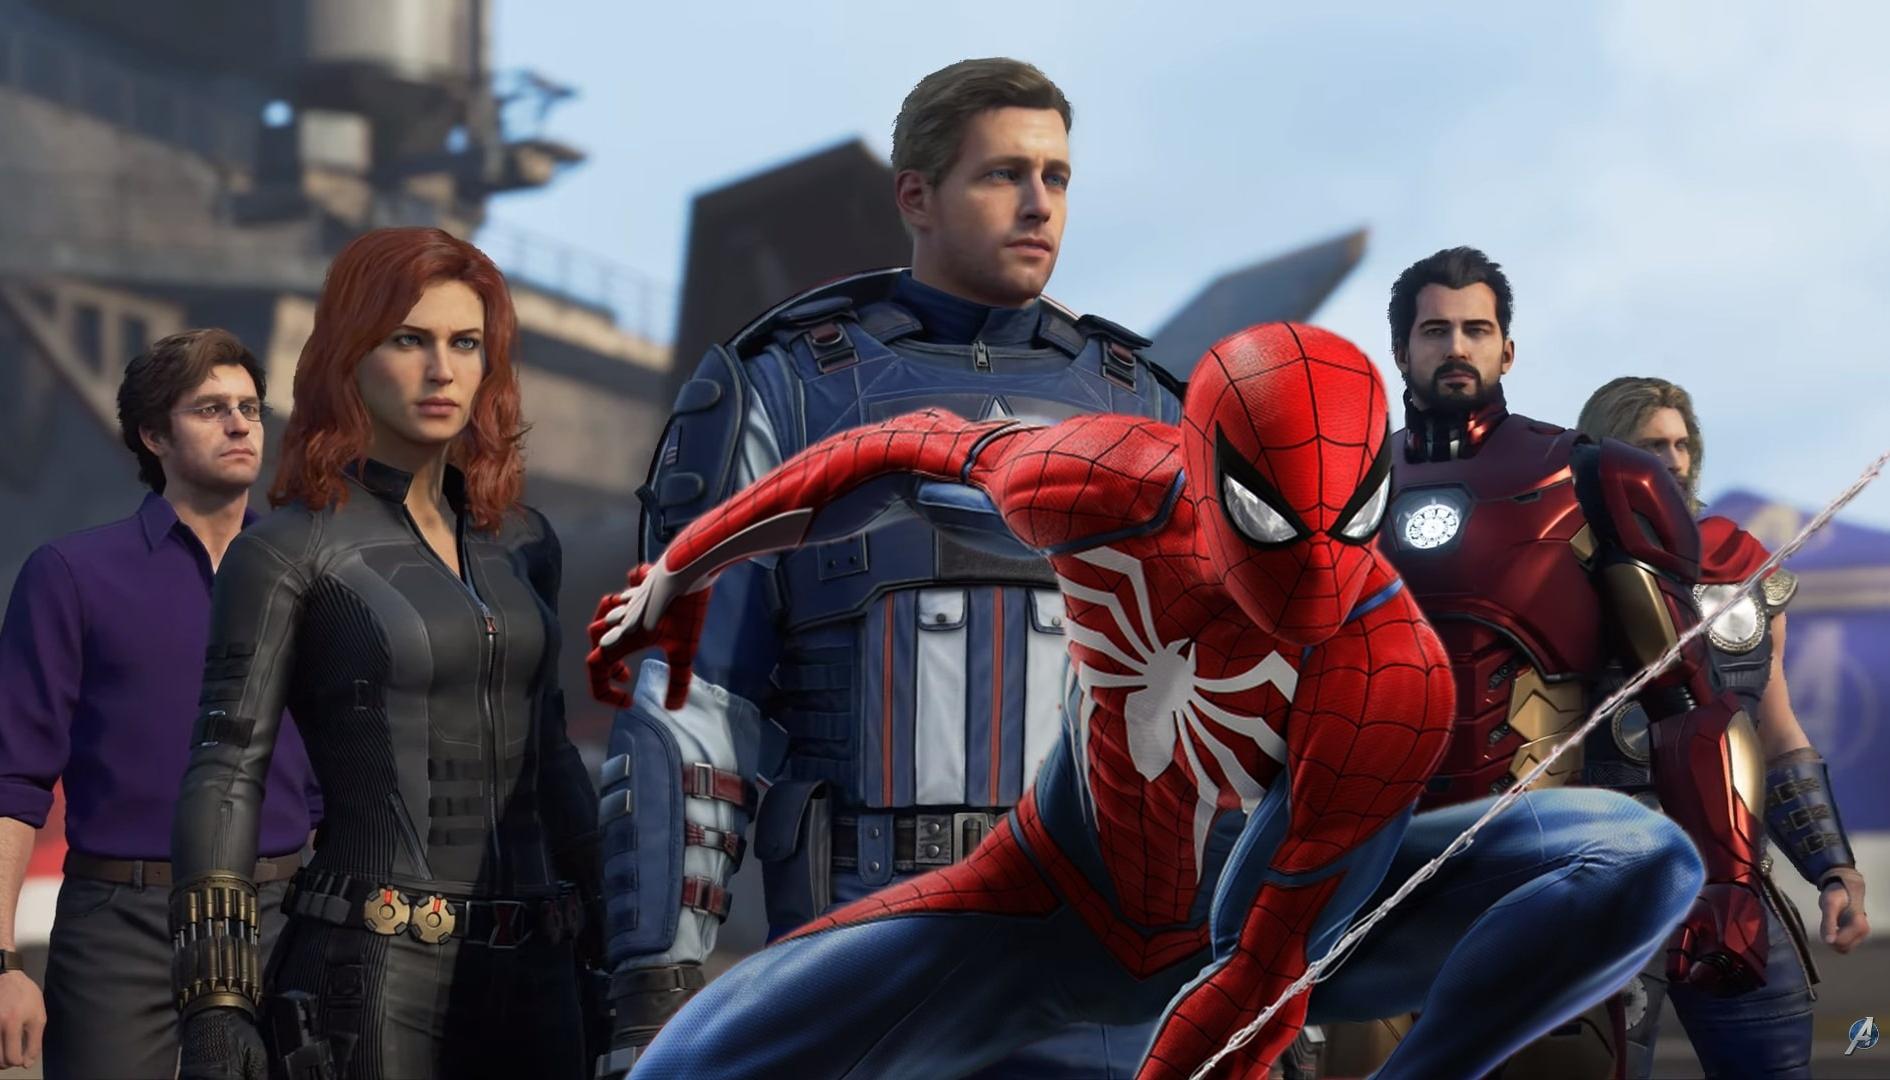 Marvel's Avengers, i motivi dietro l'esclusiva di Spider-Man su PlayStation